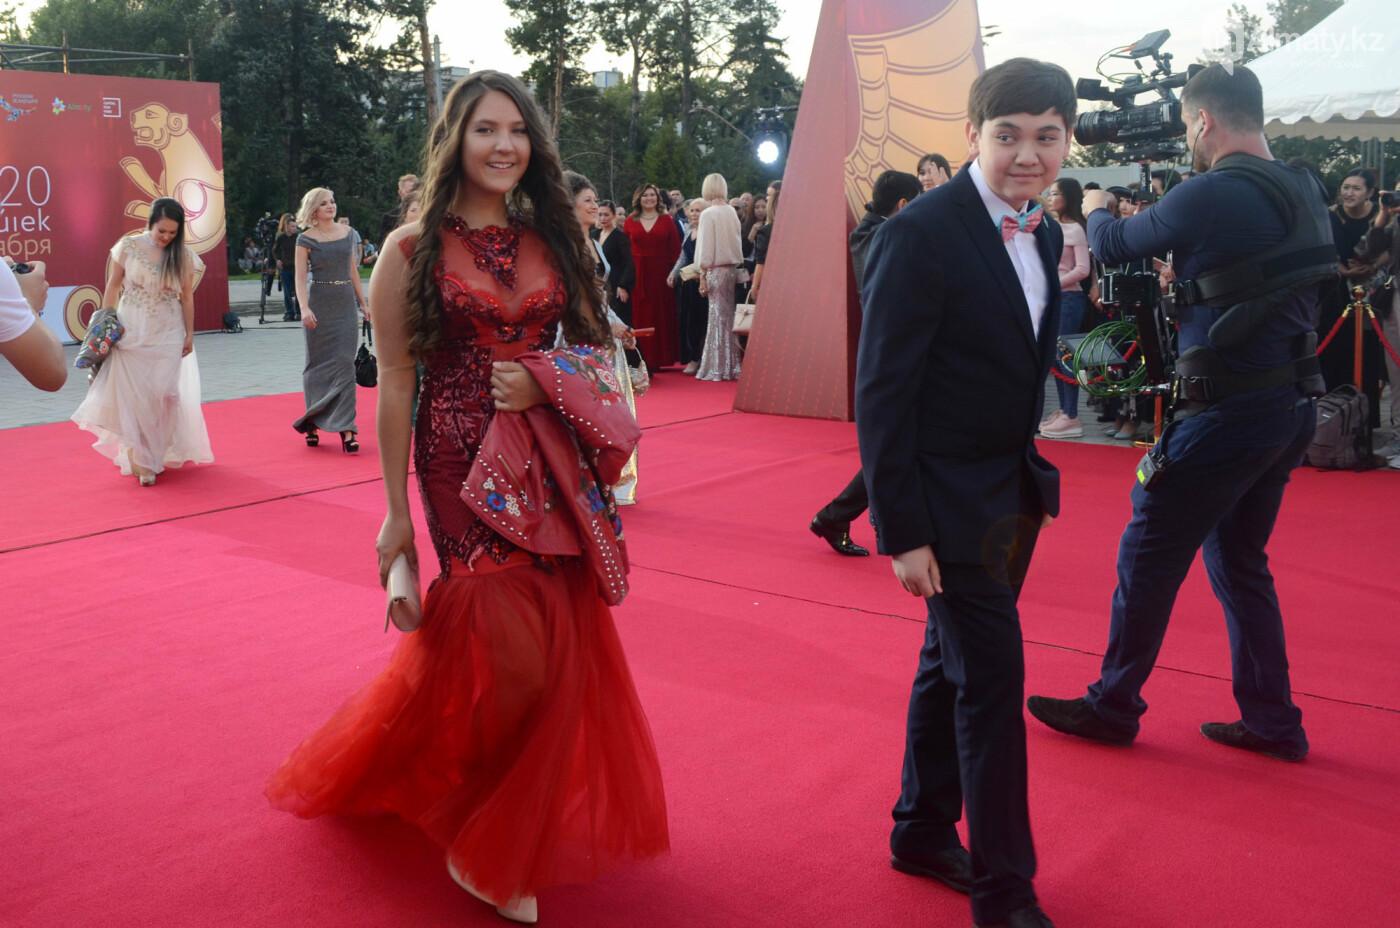 Второй Almaty Film Festival открылся фильмом «Тайна печати дракона» (фото), фото-4